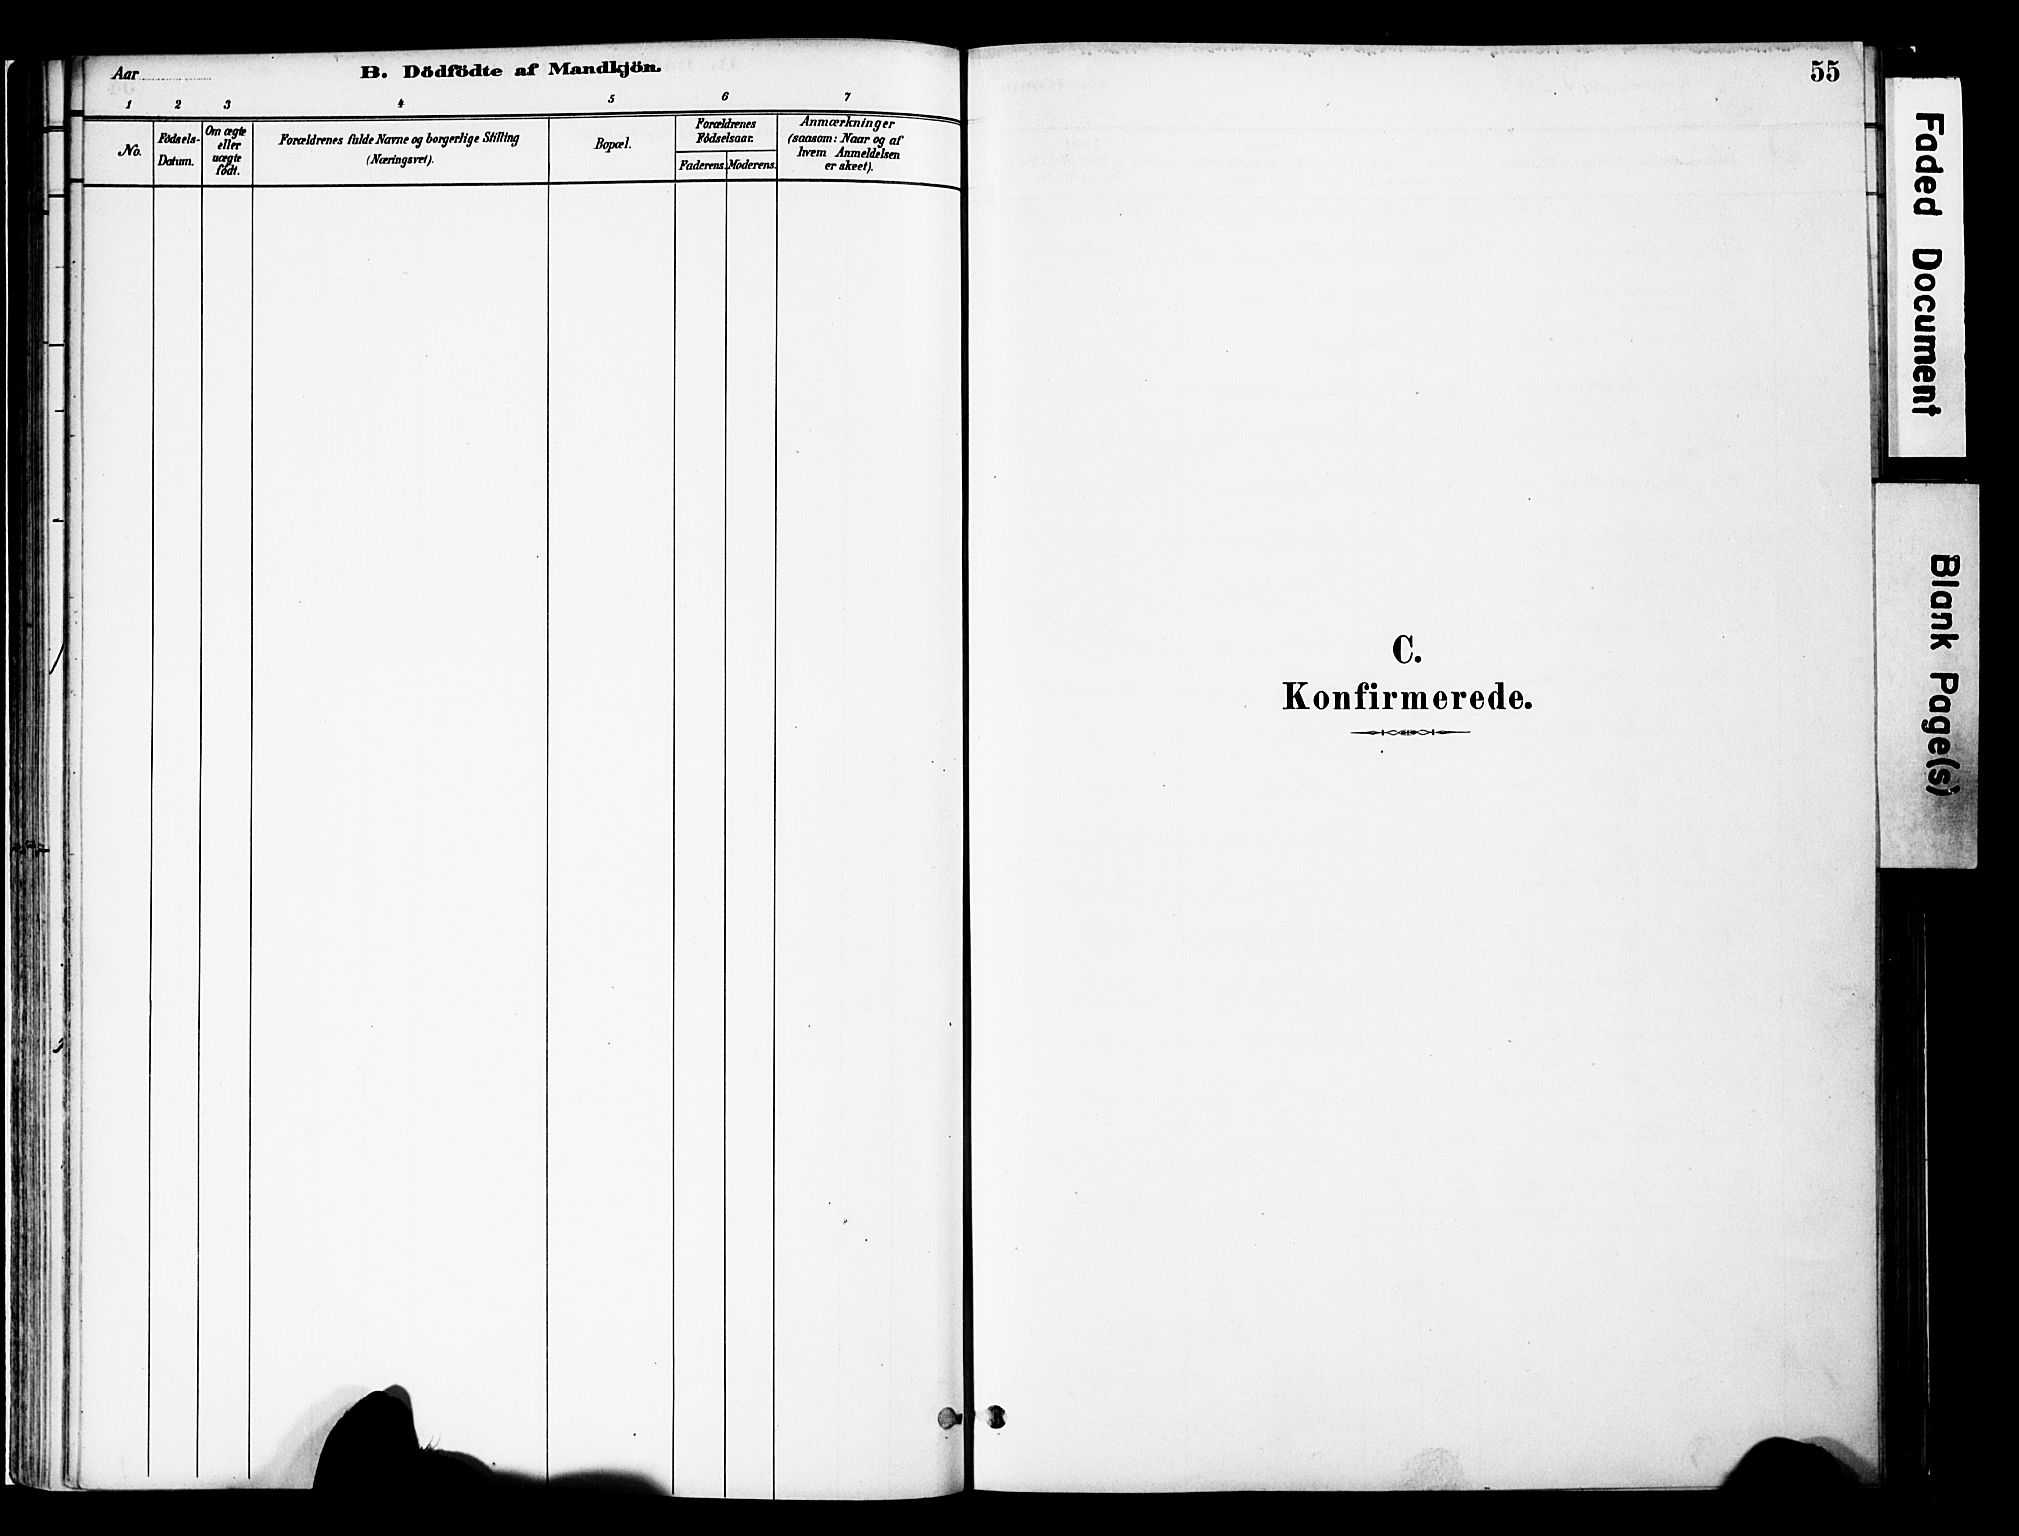 SAH, Vestre Slidre prestekontor, Ministerialbok nr. 5, 1881-1912, s. 55